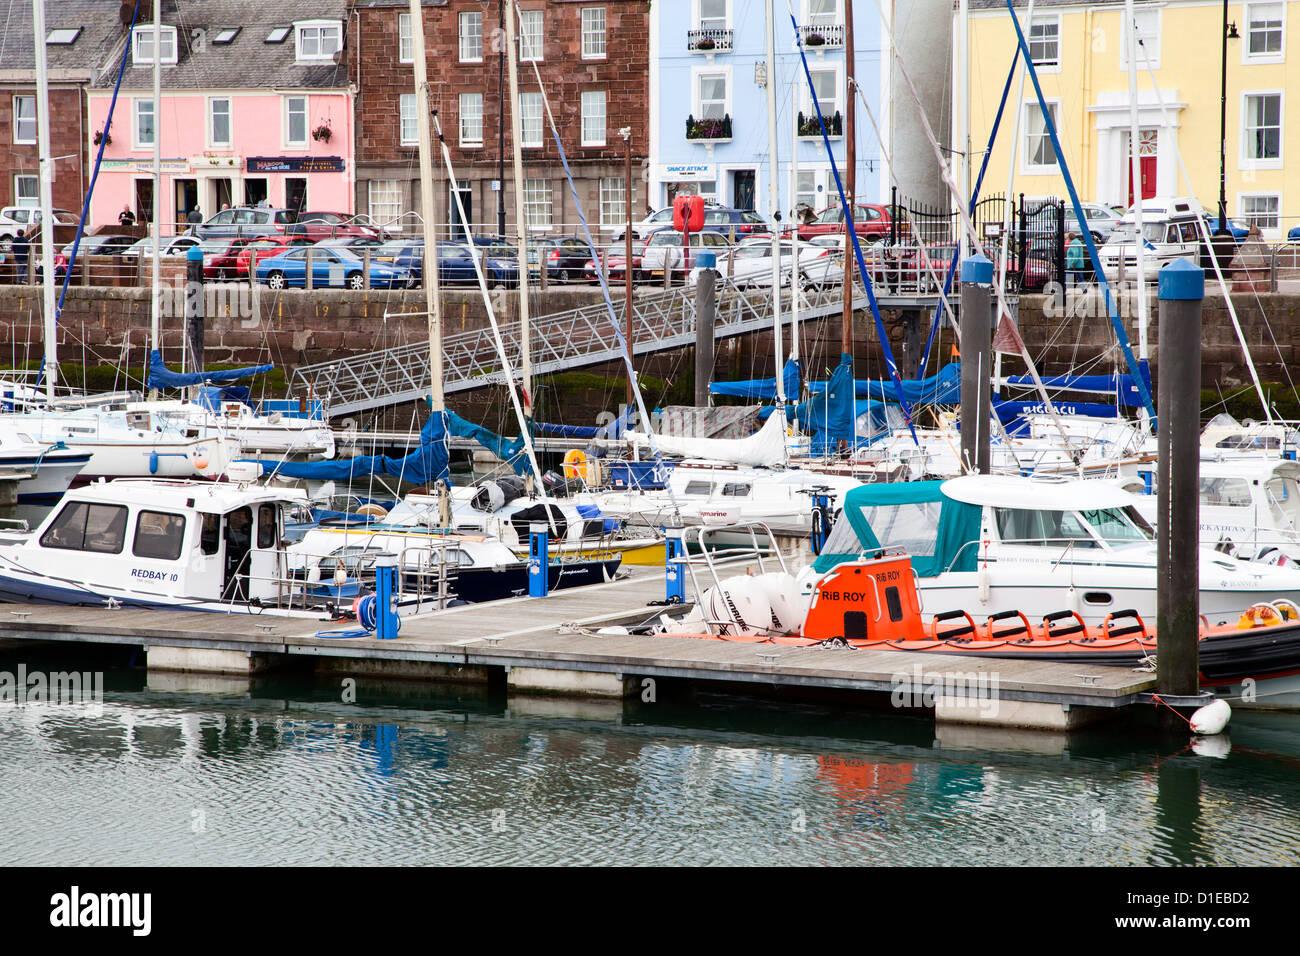 Boats at Arbroath Harbour, Arbroath, Angus, Scotland, United Kingdom, Europe - Stock Image